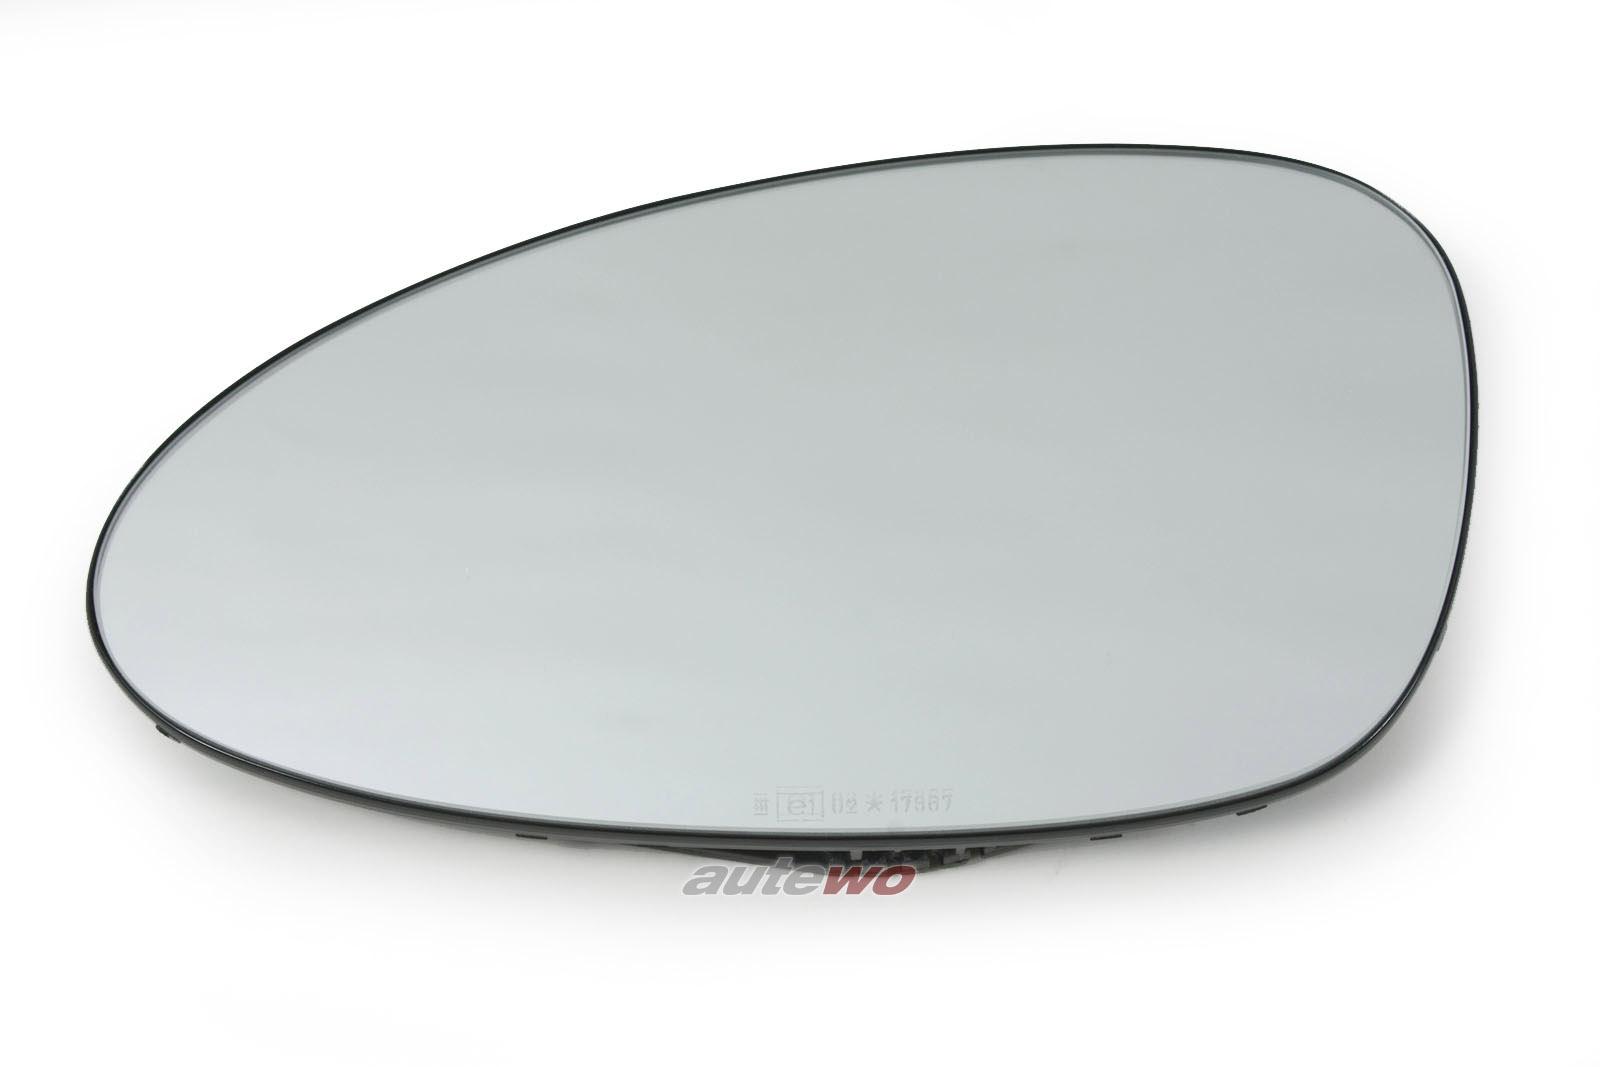 8A0857535 NEU Audi RS2 P1 2.2l Spiegelglas elektrisch beheizbar Links